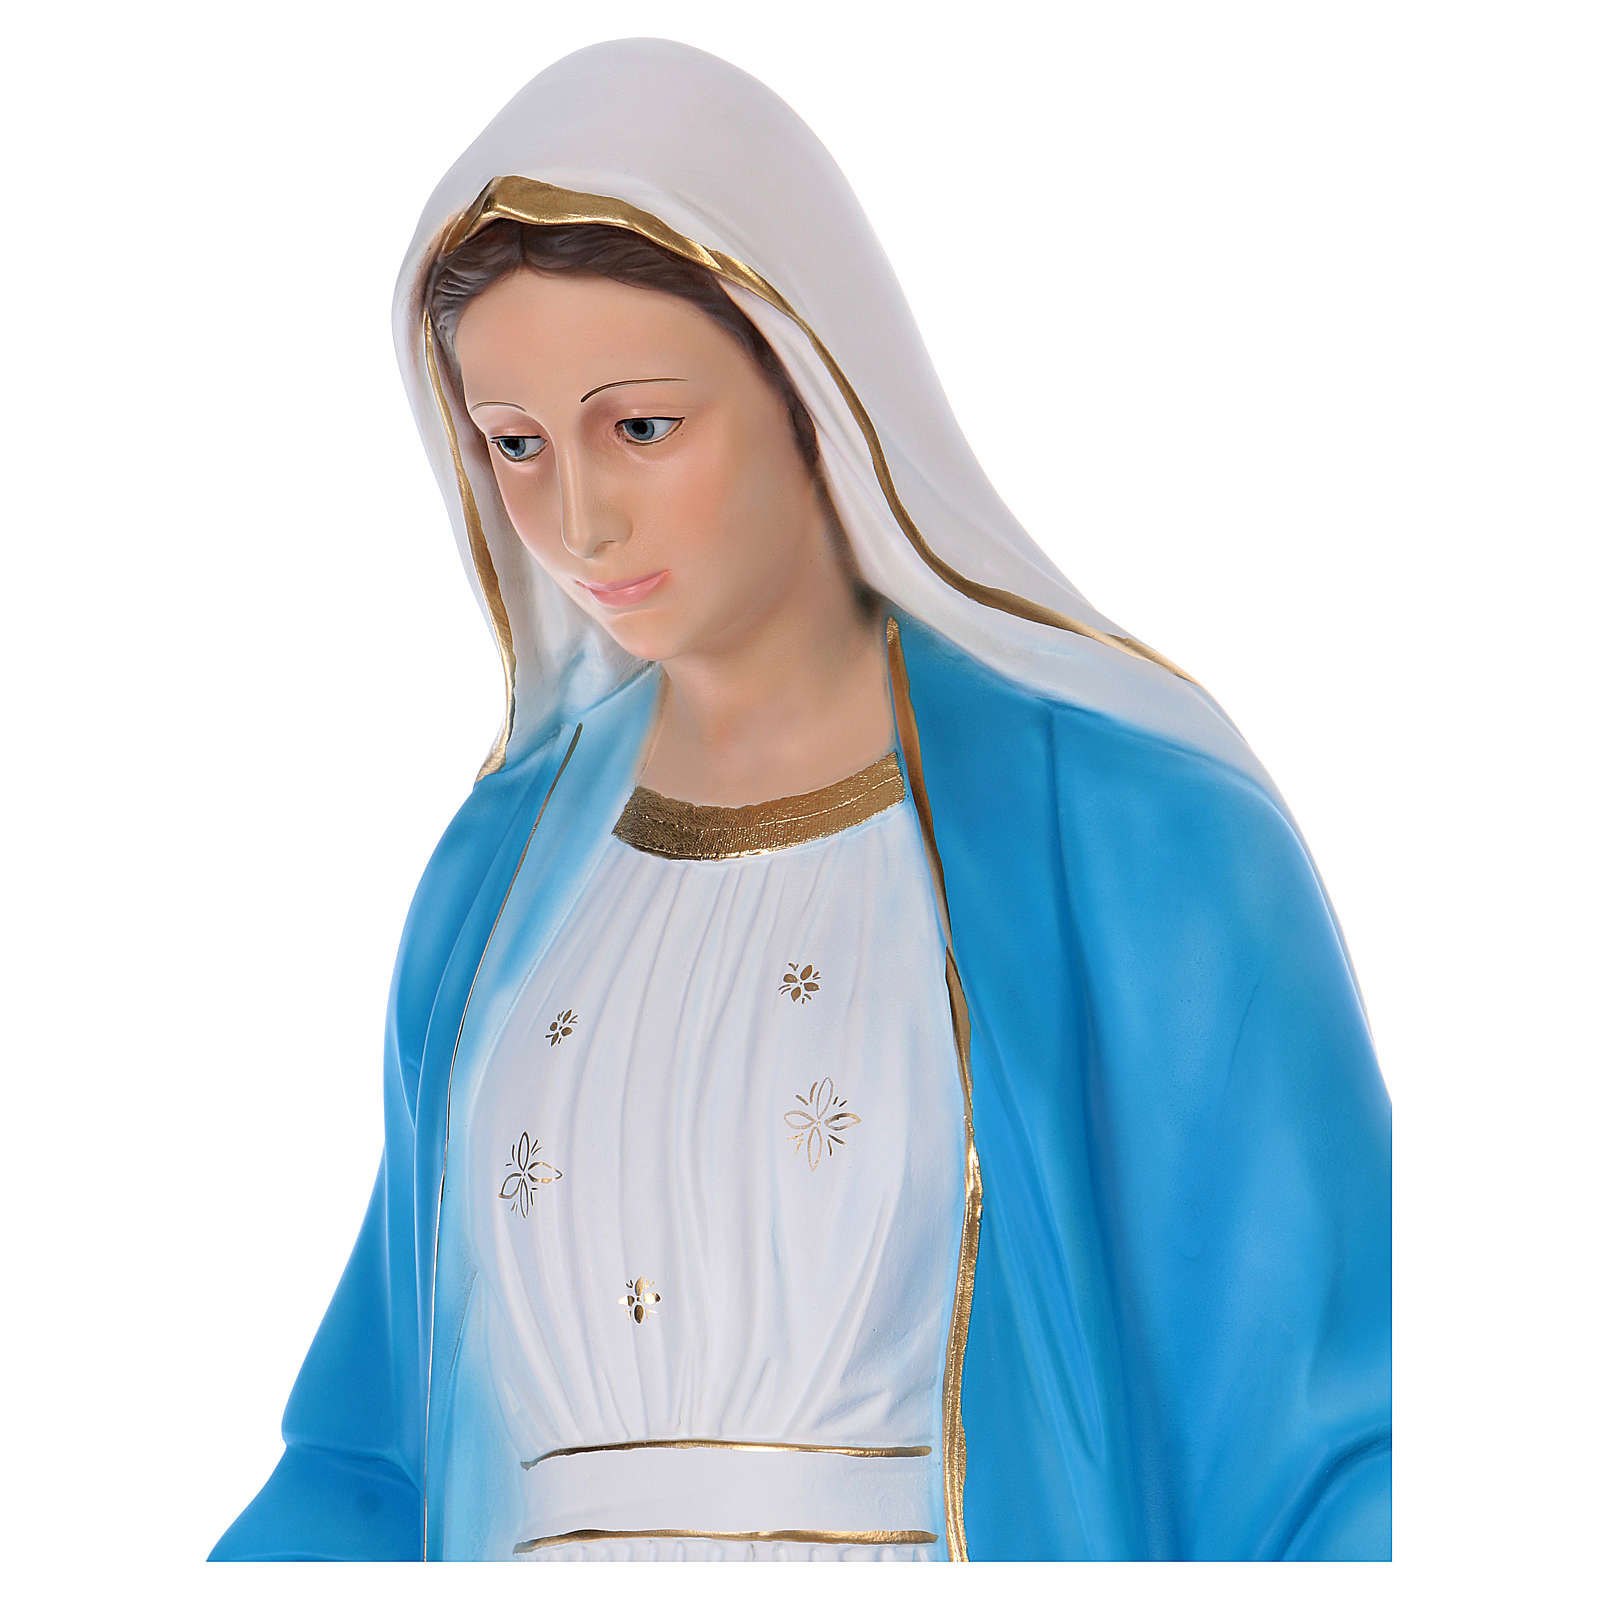 Virgen Milagrosa 120 cm estatua de resina 4